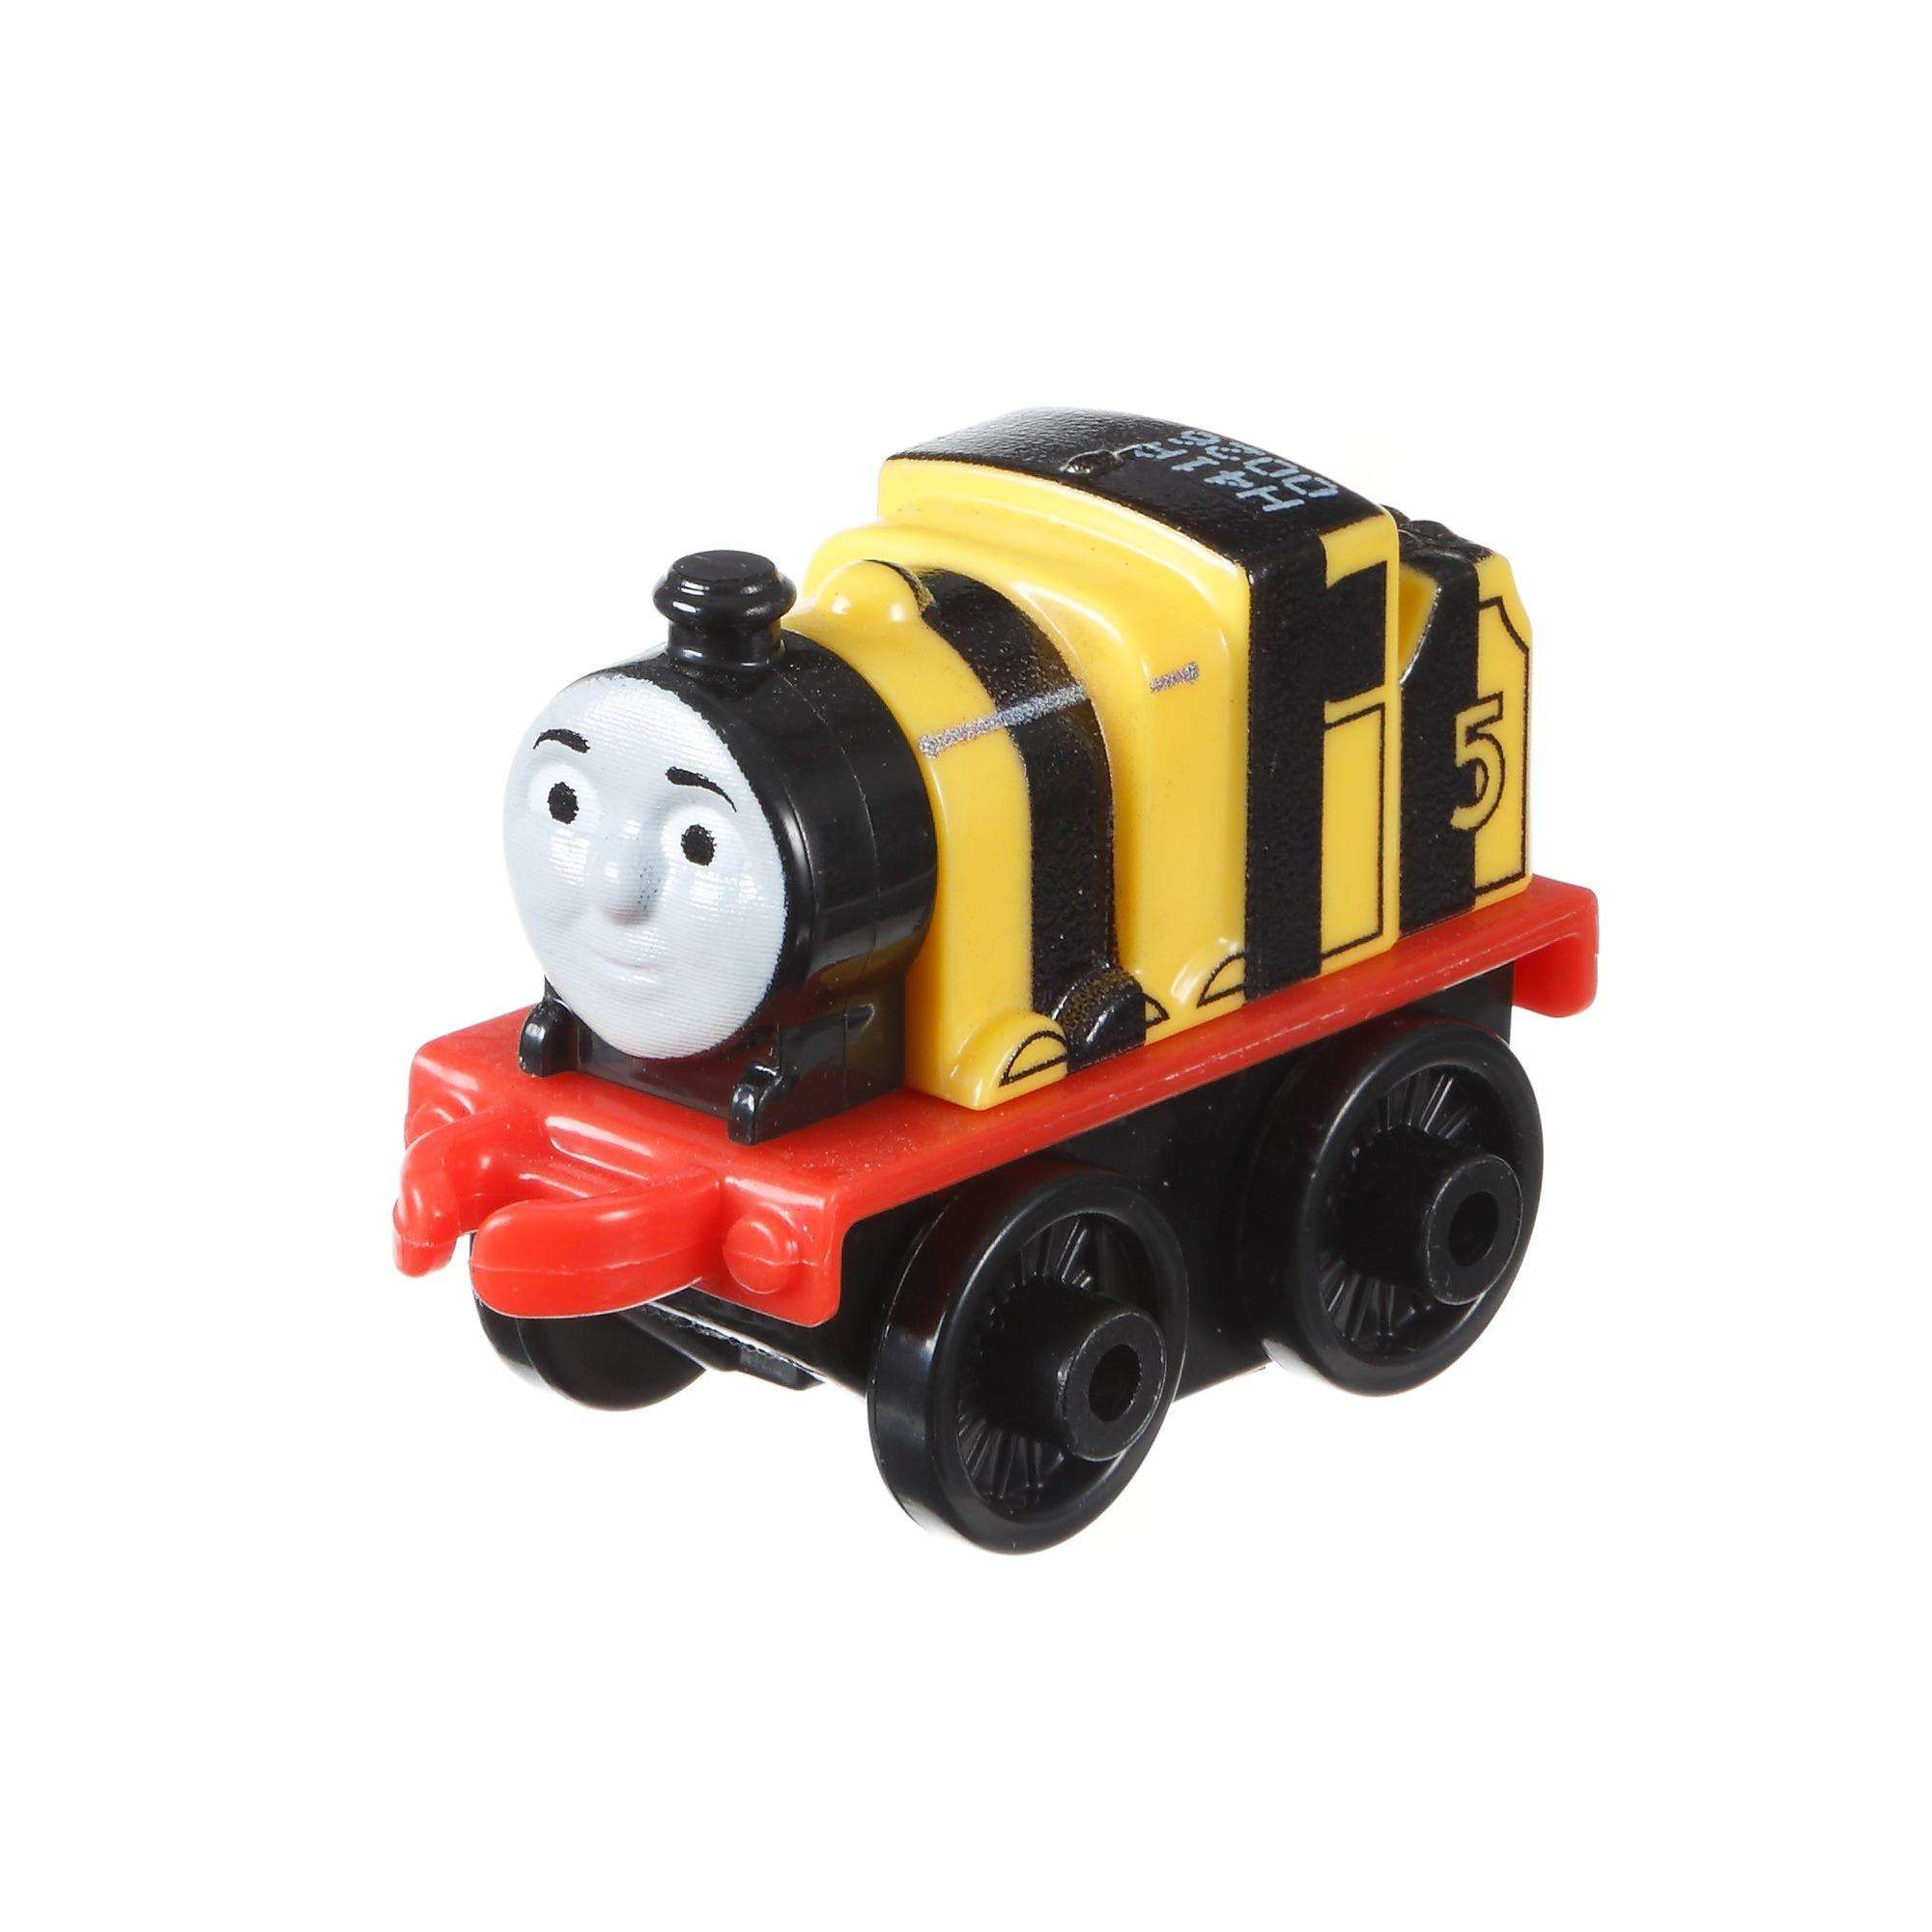 Thomas /& Friends Minis Light Ups Set Lot of 6 New Free Shipping